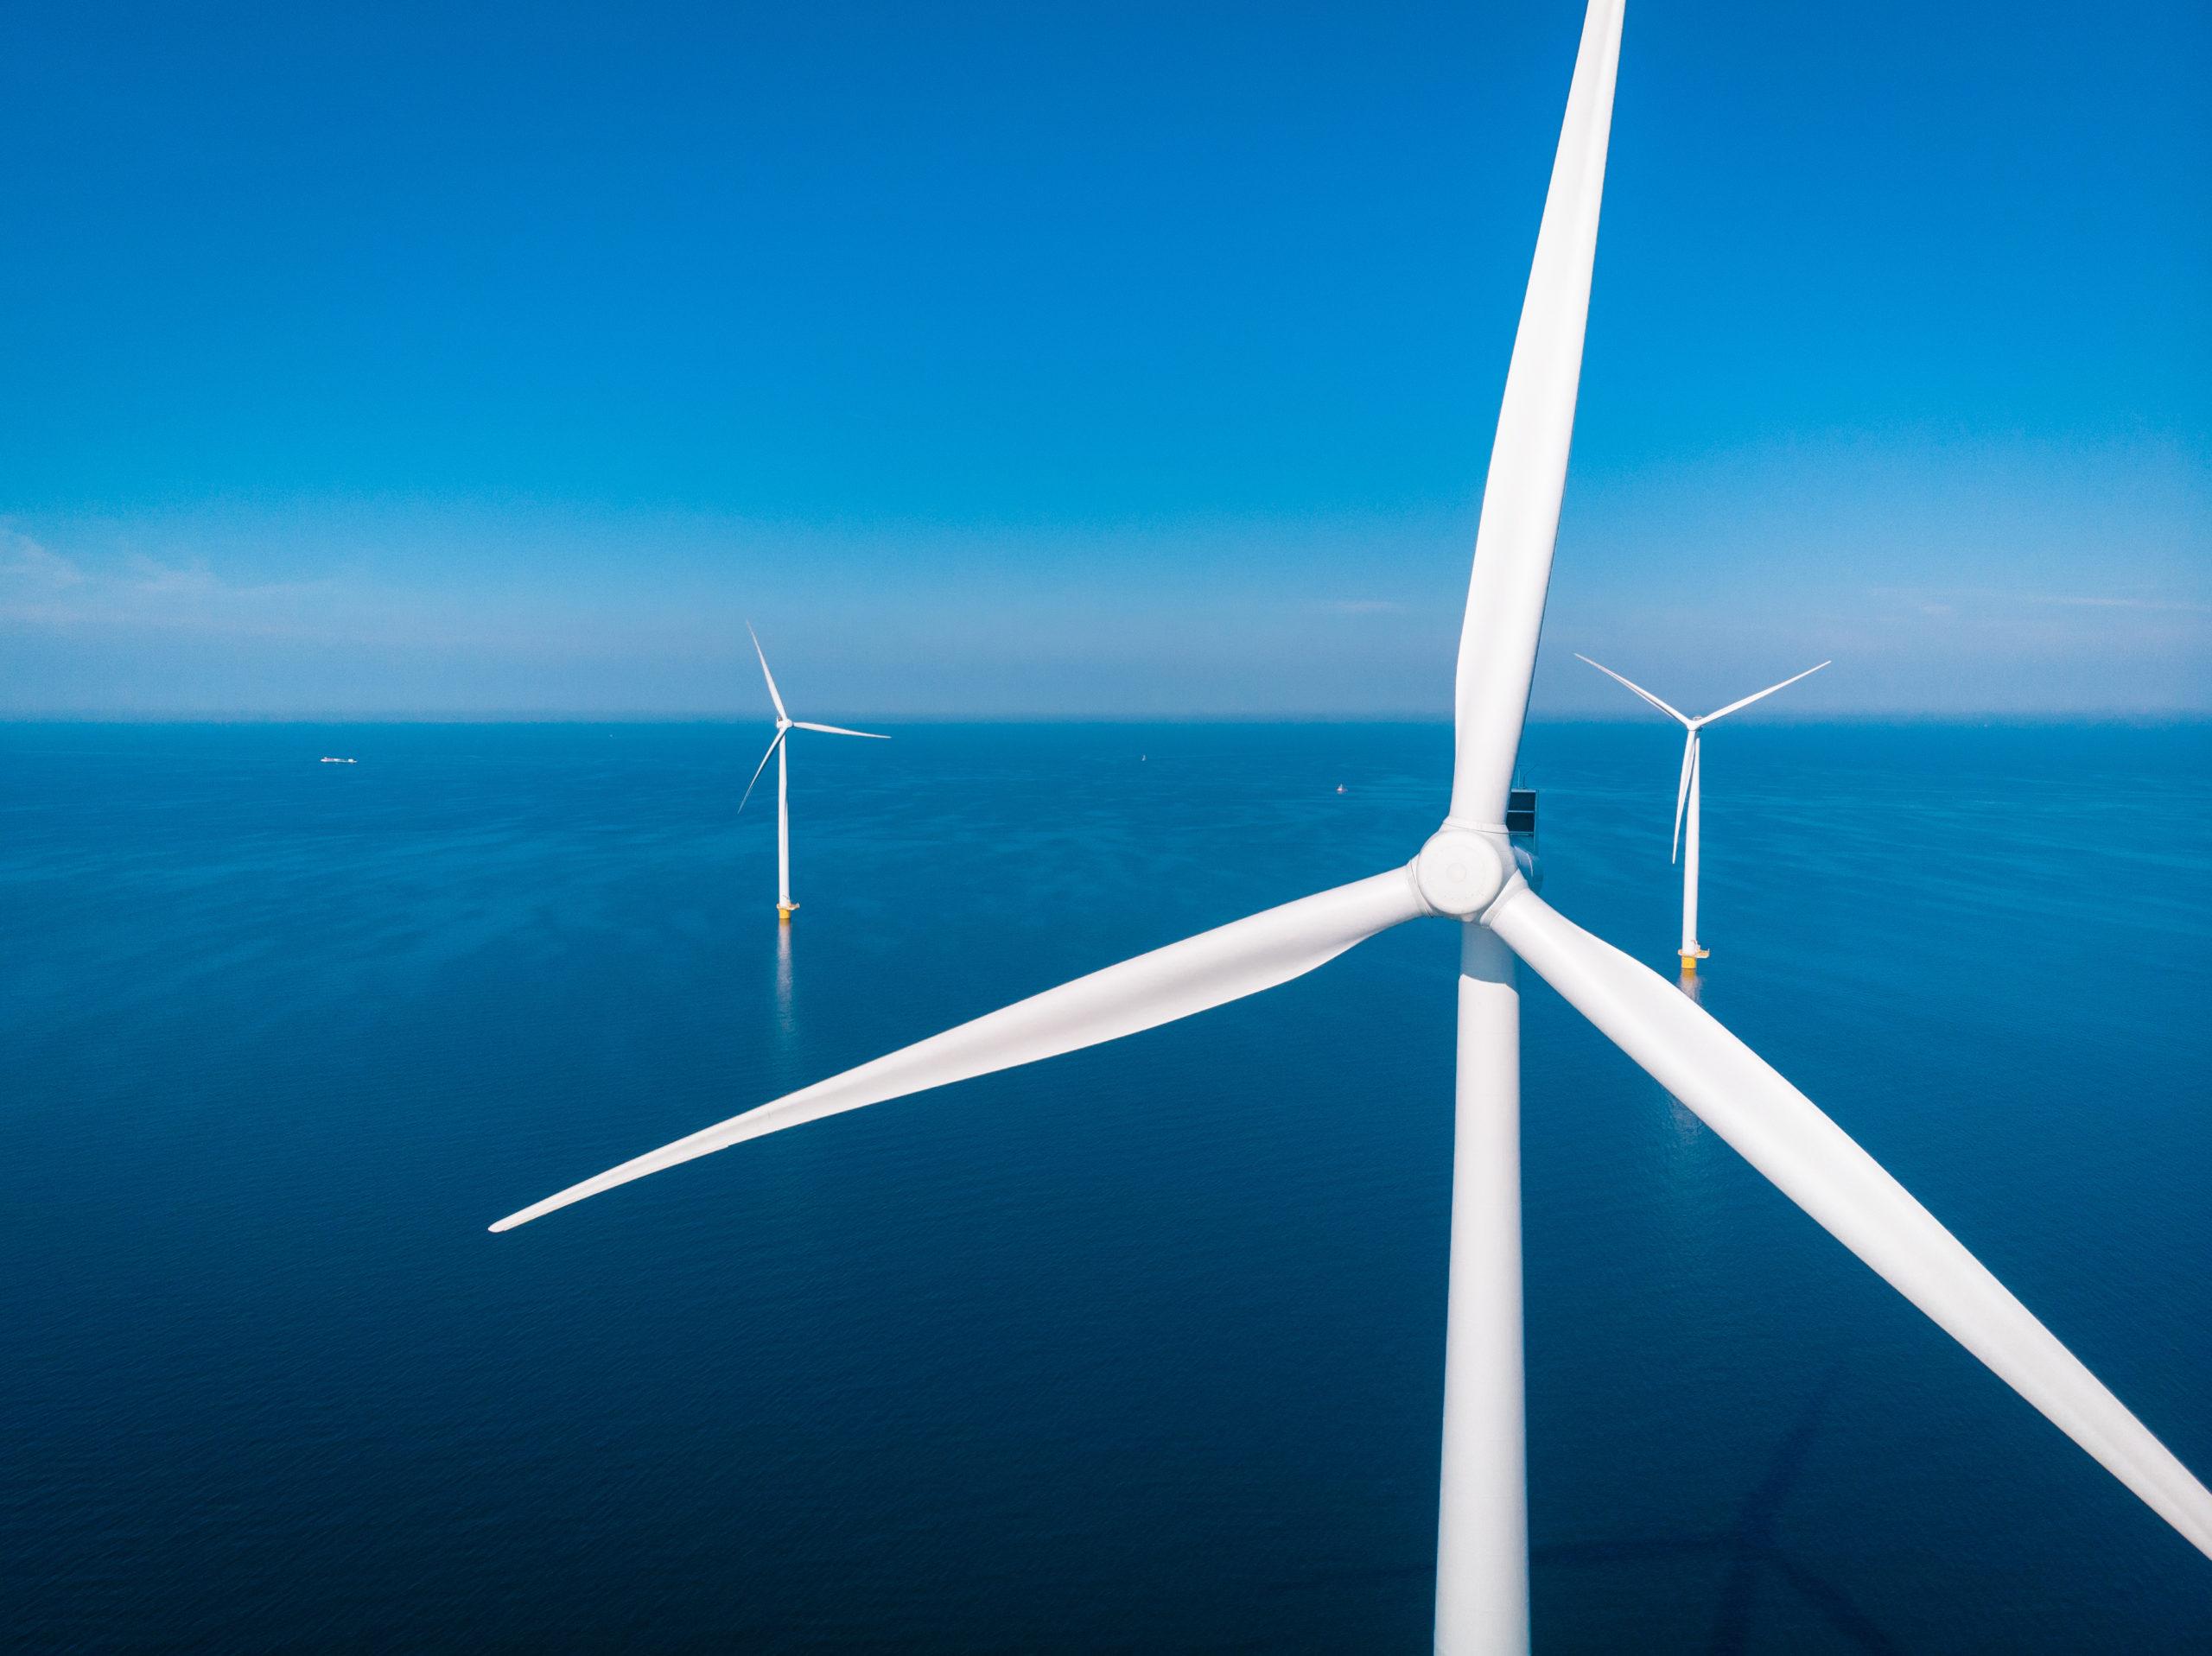 Europejski sektor offshore wind ustanowił rekord inwestycji – 26 mld euro w 2020 r.